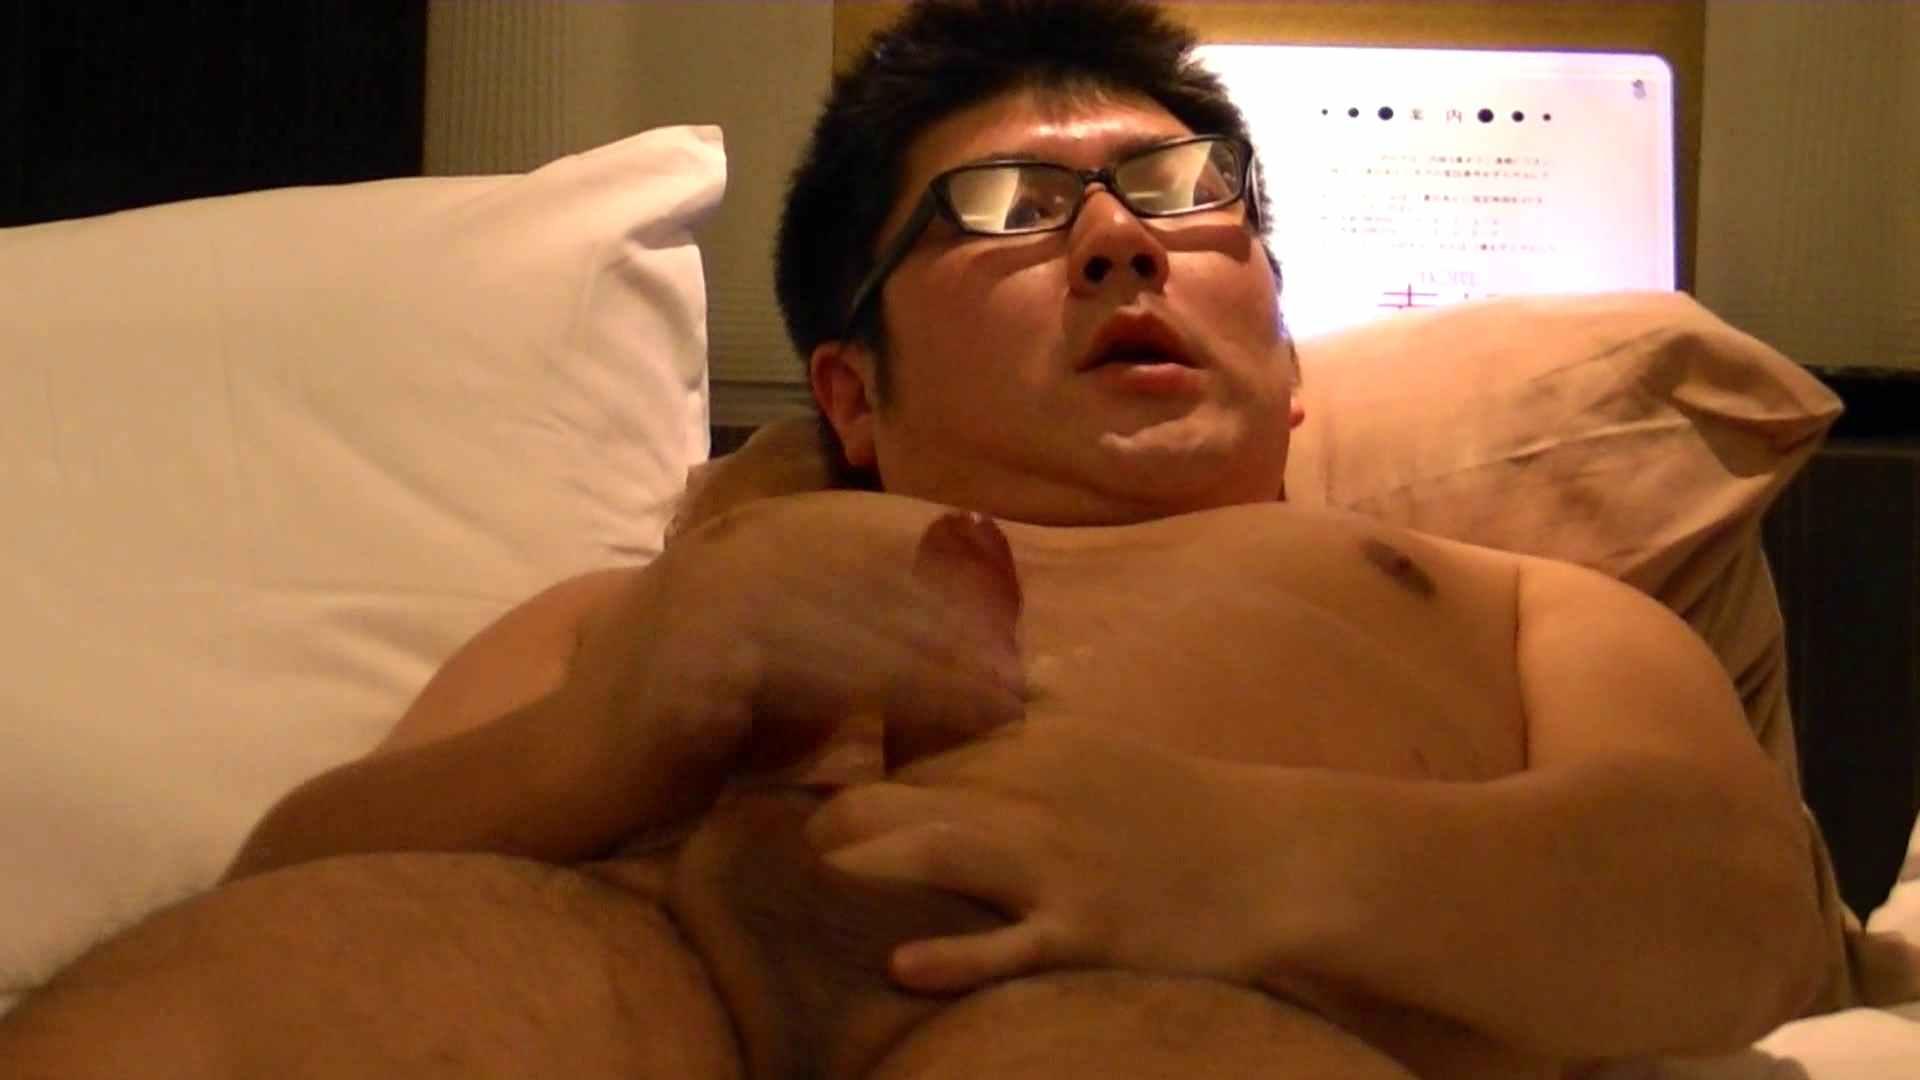 Mr.オナックスさん投稿!HD 貴方のオナニー三万円で撮影させてください。VOL.03 後編 完全無修正でお届け | オナニー特集  83pic 7